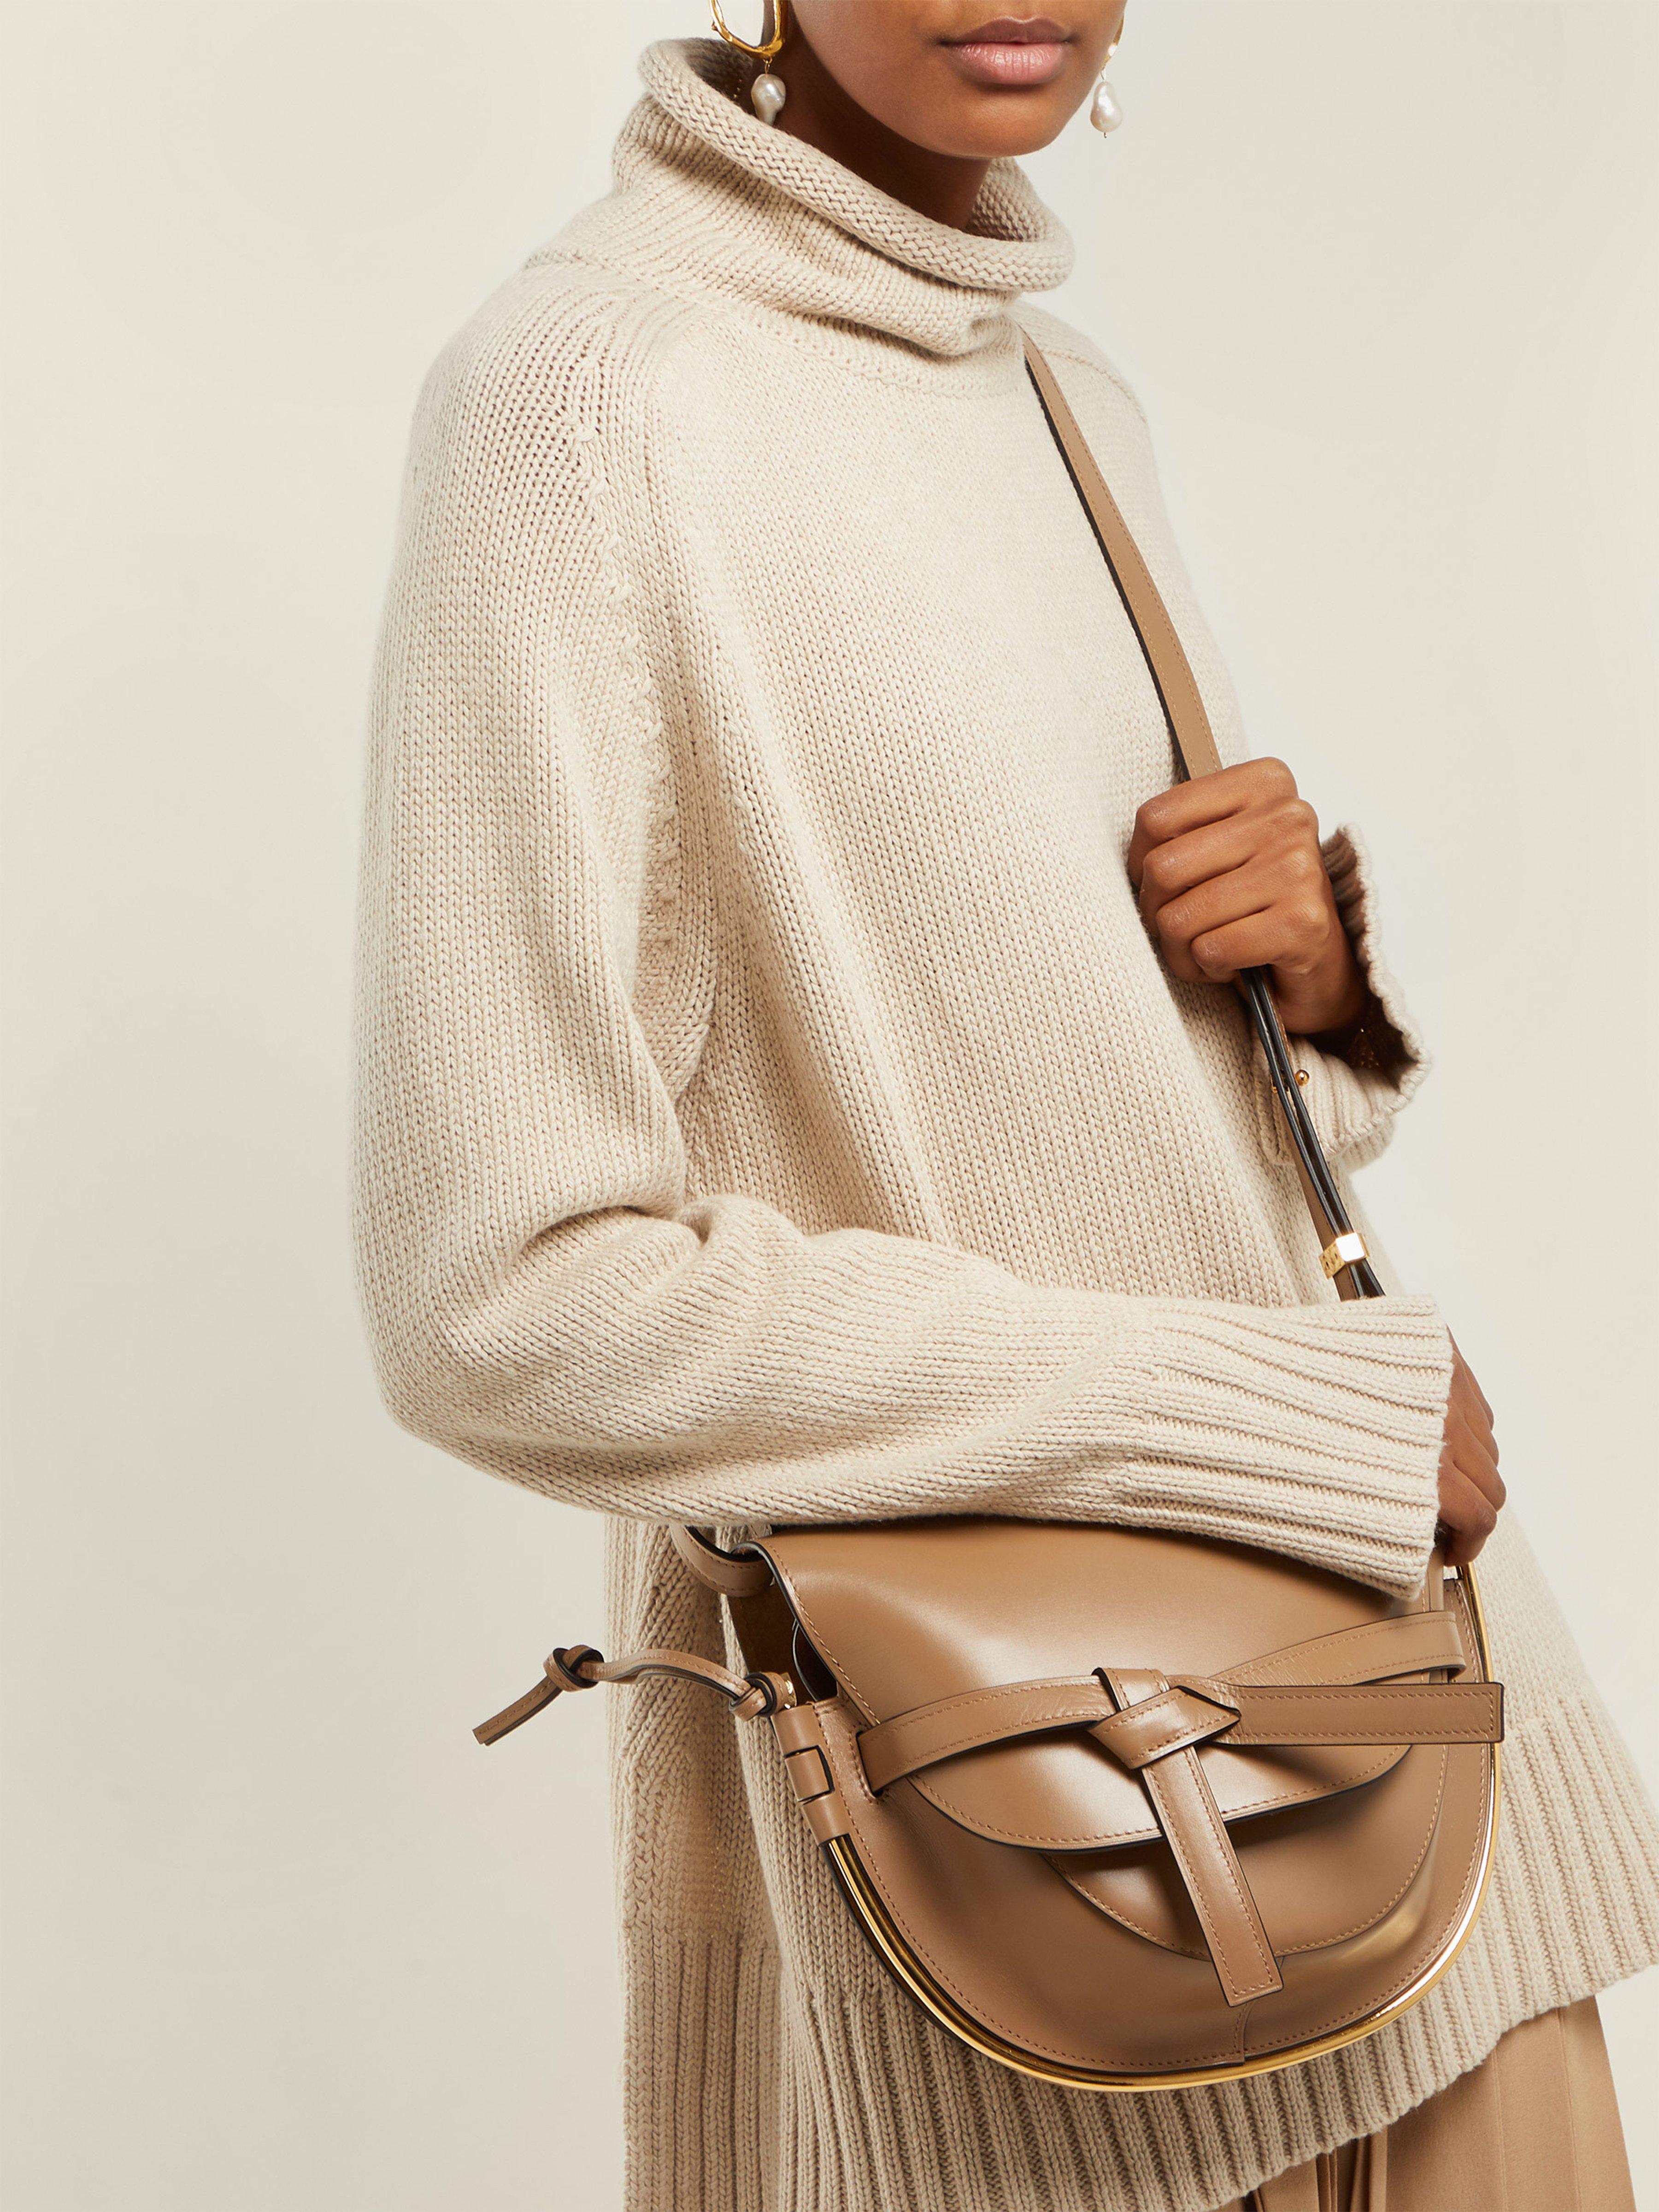 97757216e98d Loewe Gate Small Leather Cross Body Bag - Lyst